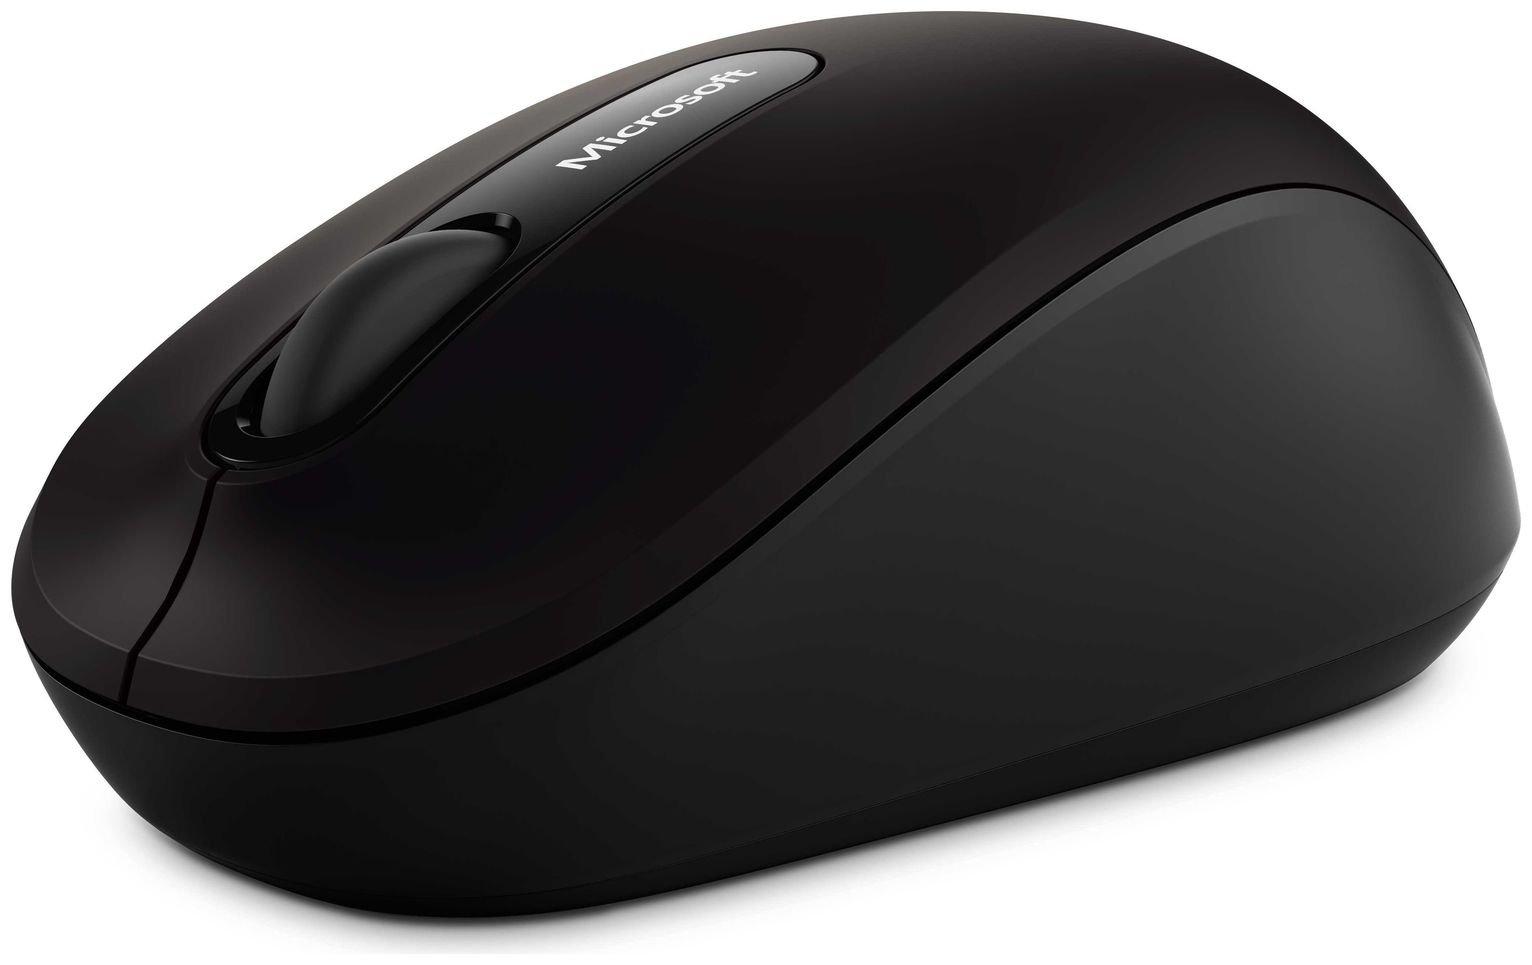 Microsoft 3600 Bluetooth Mouse - Black